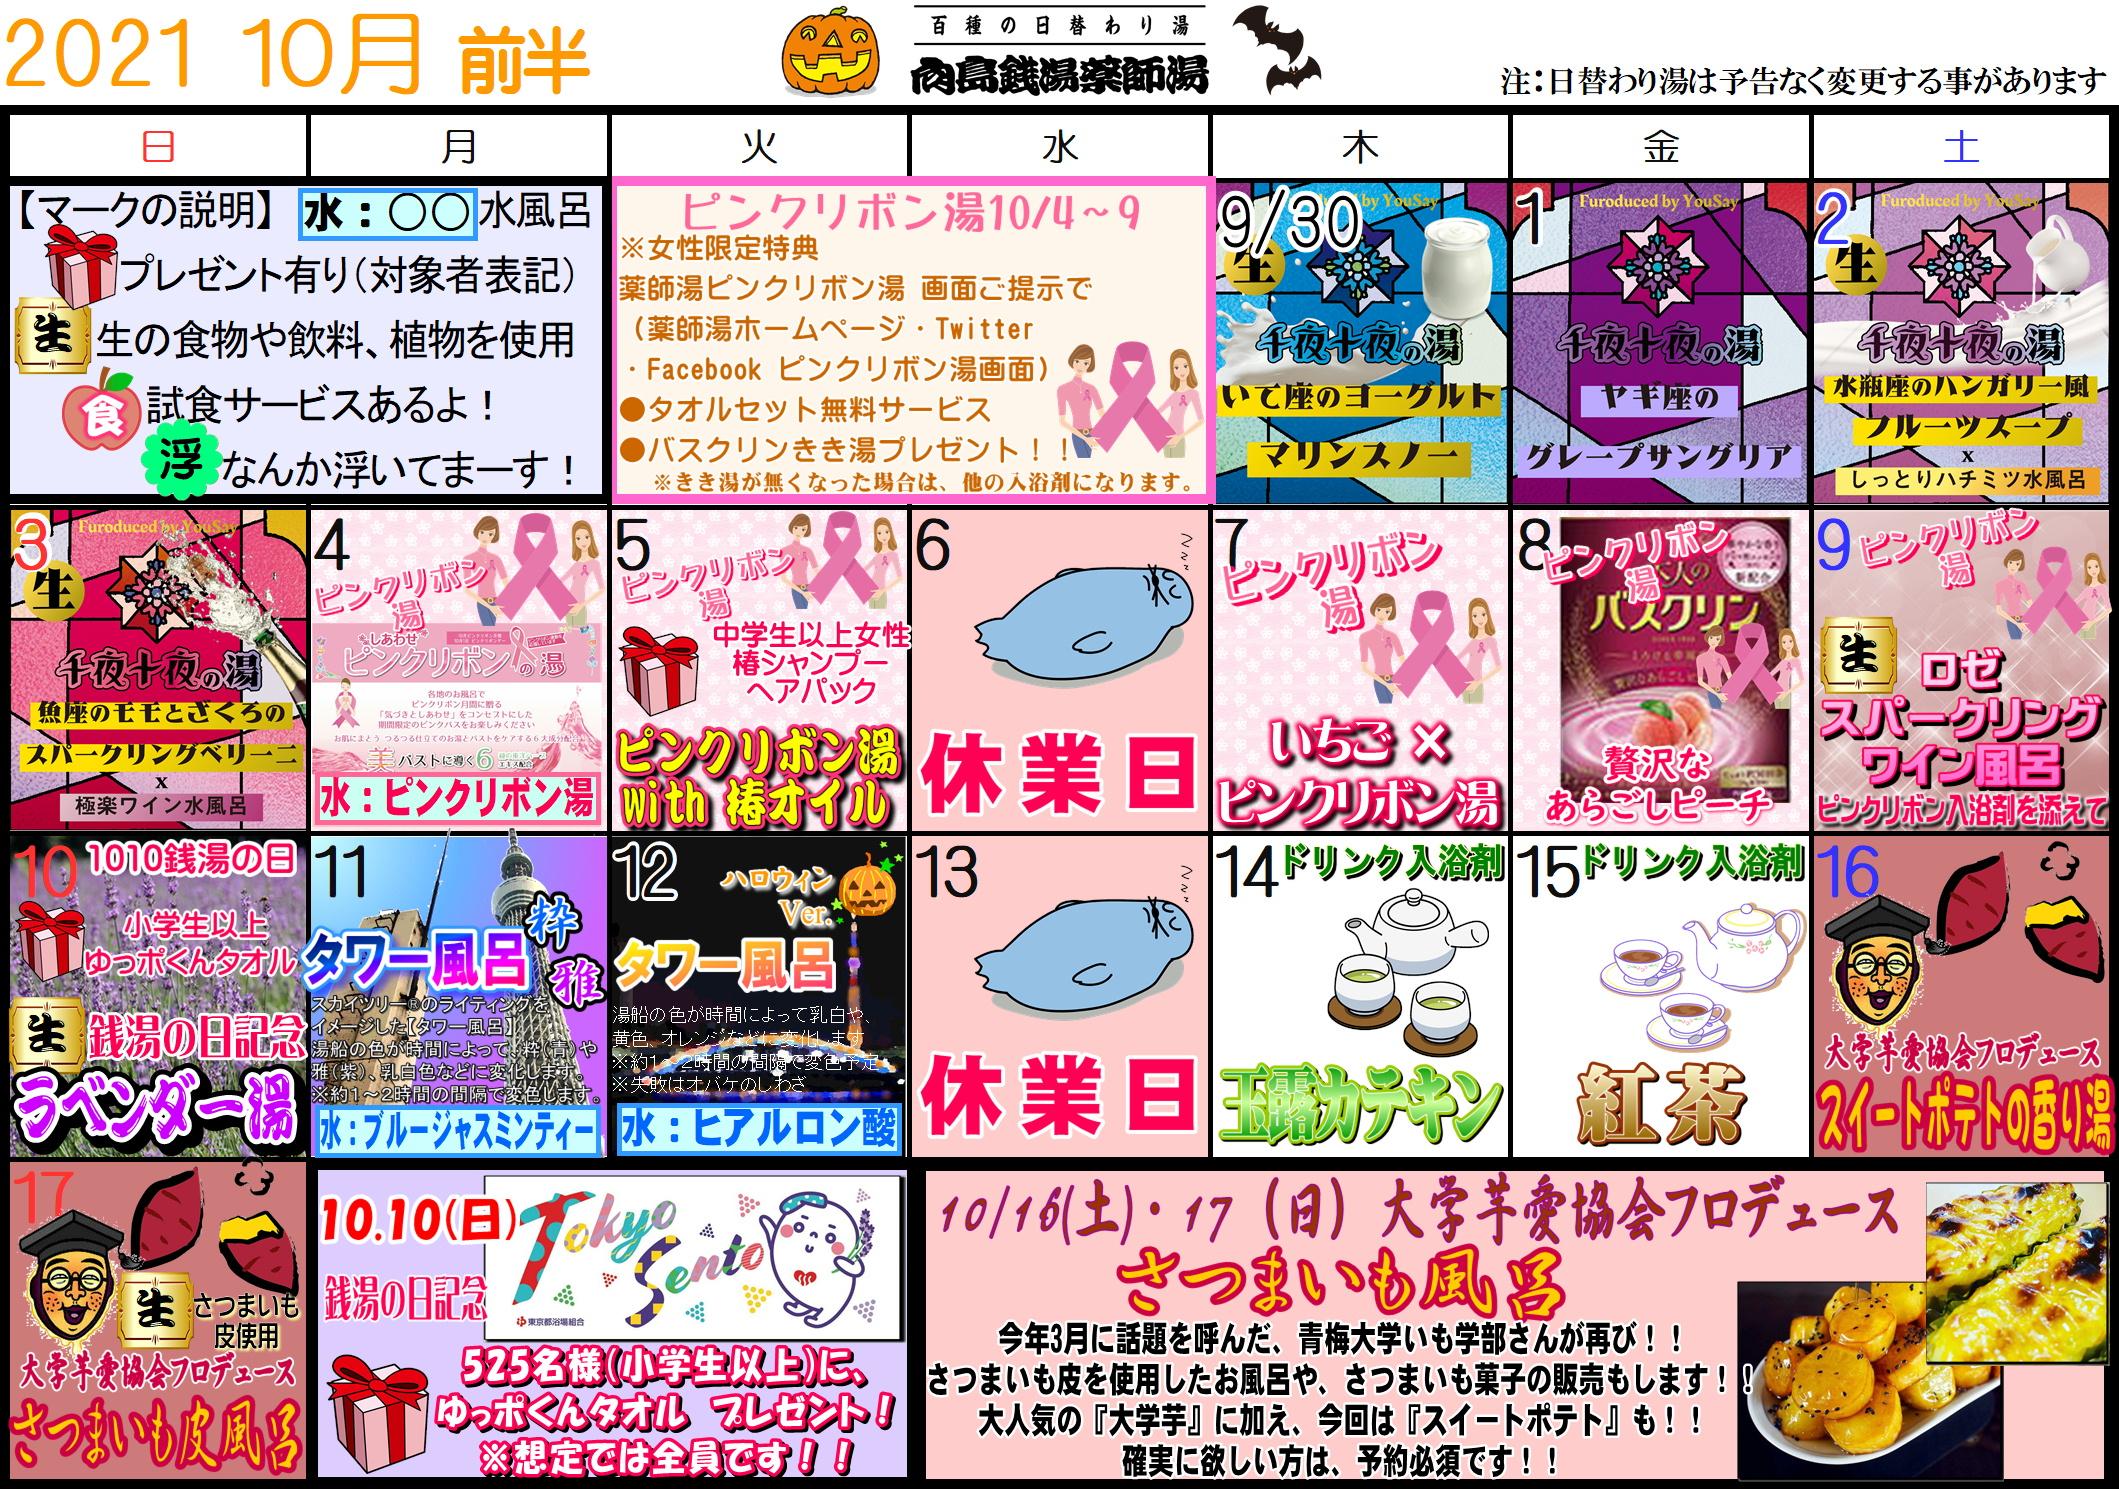 【日替り薬湯】10月前半